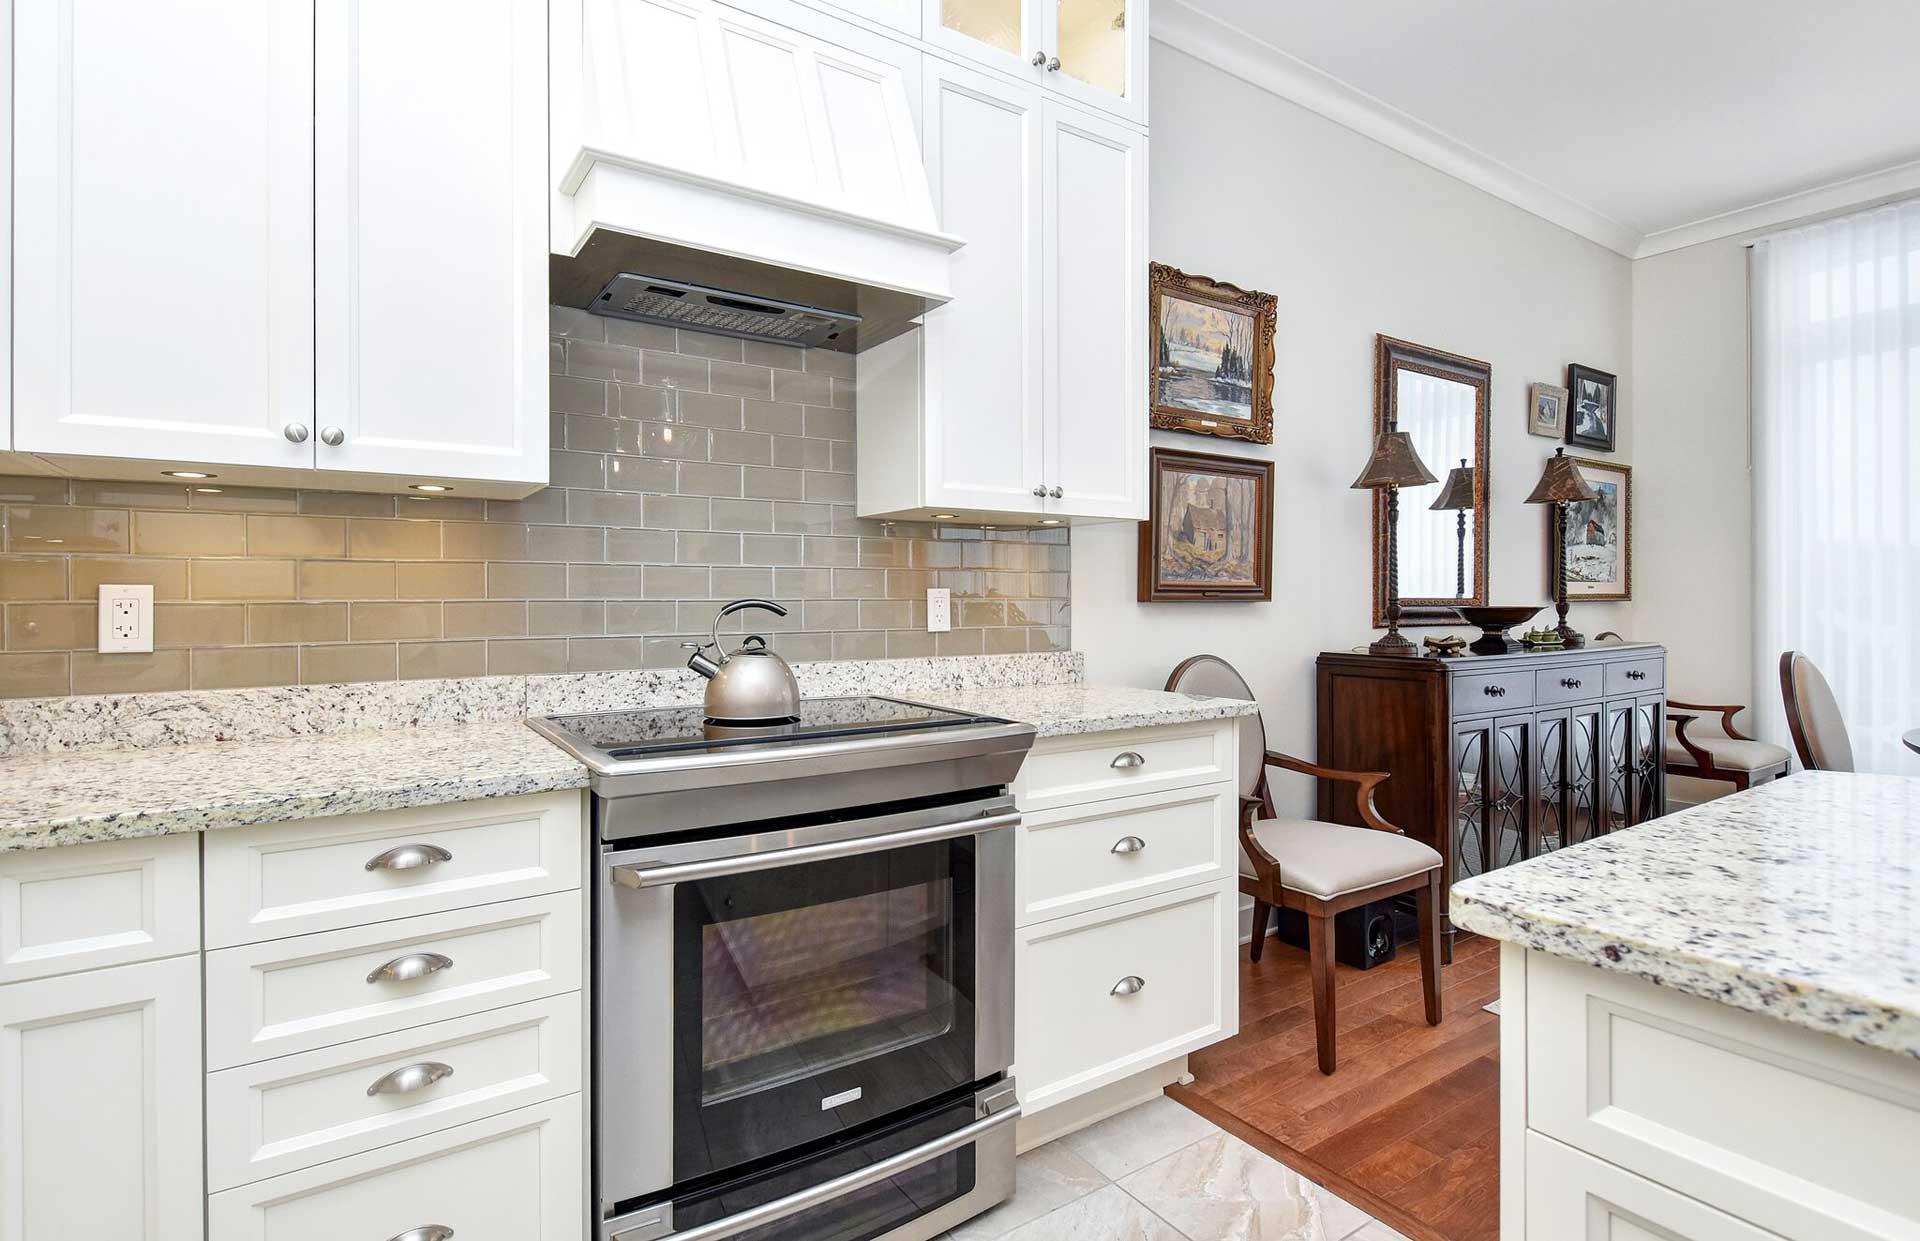 condo living, condo kitchen, shaker cabinets, granite countertop, glass subway tile backsplash